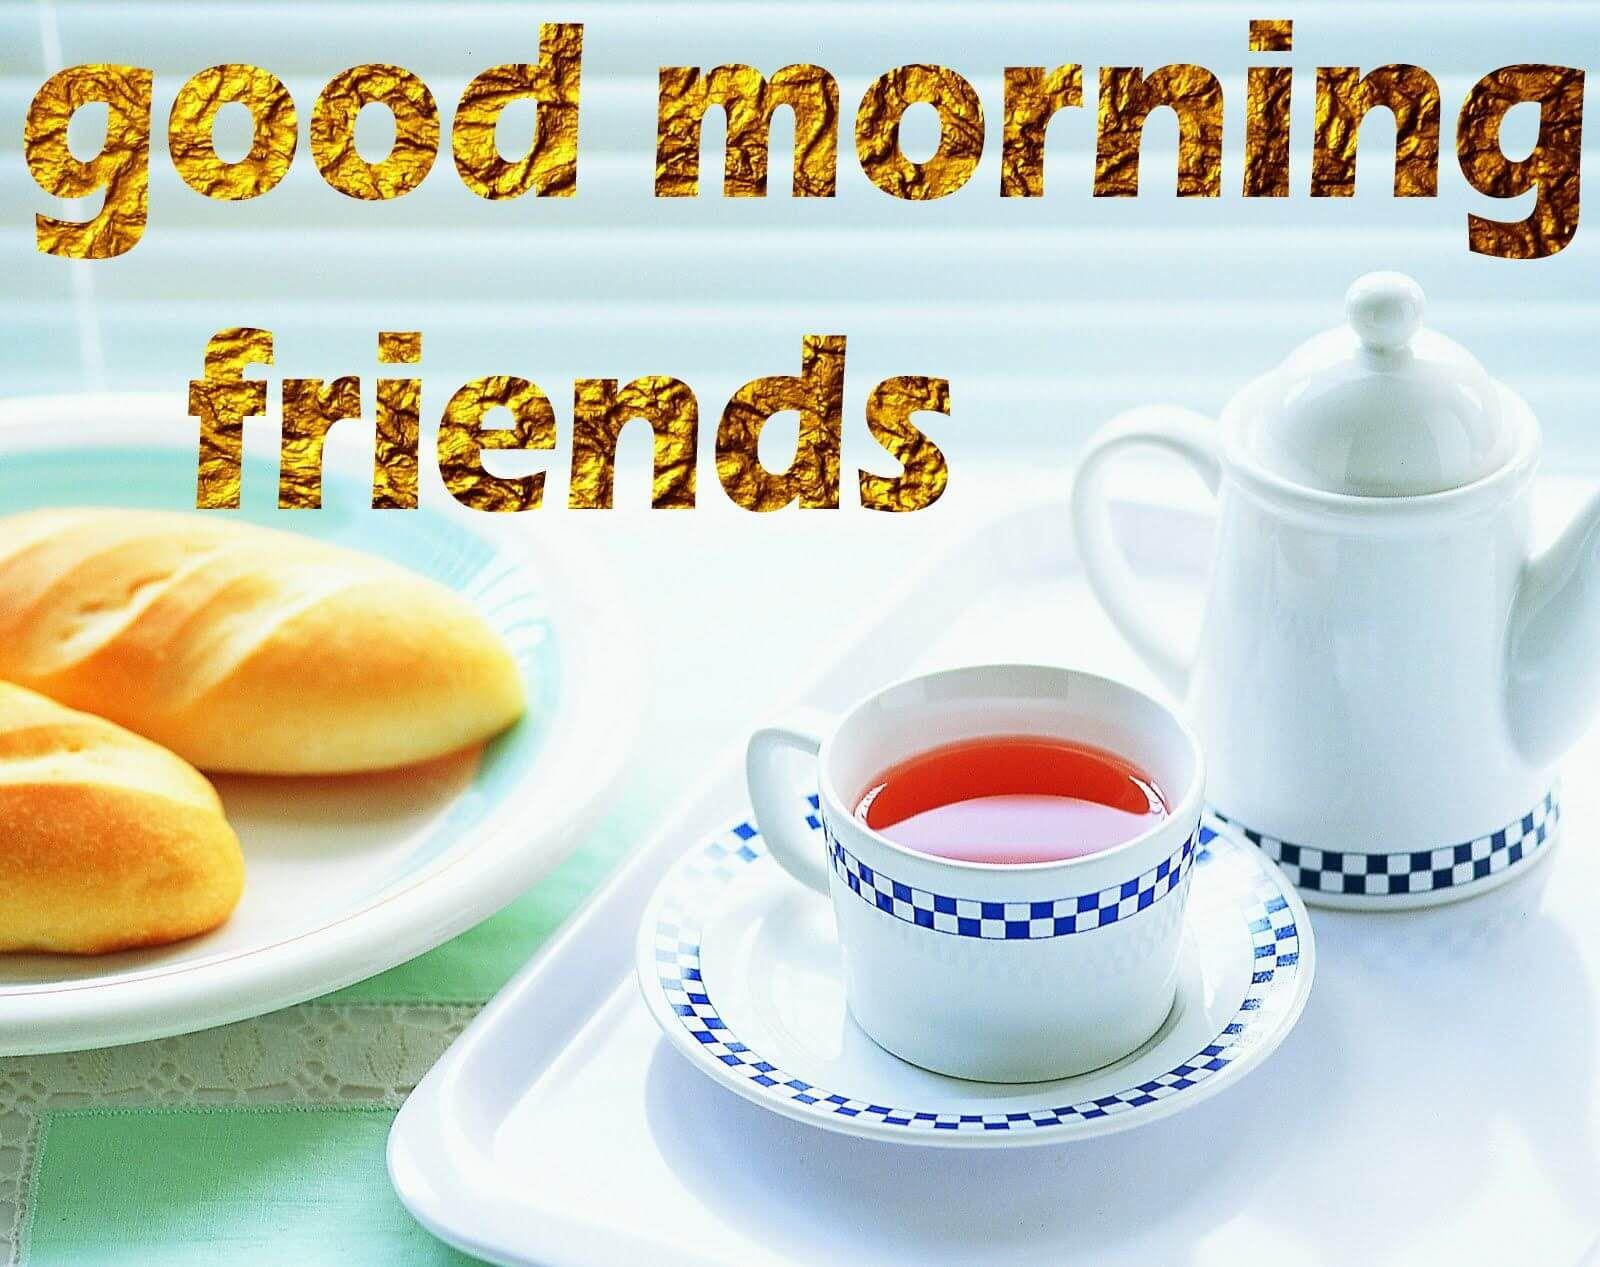 New good morning wallpaper photo download hd full0